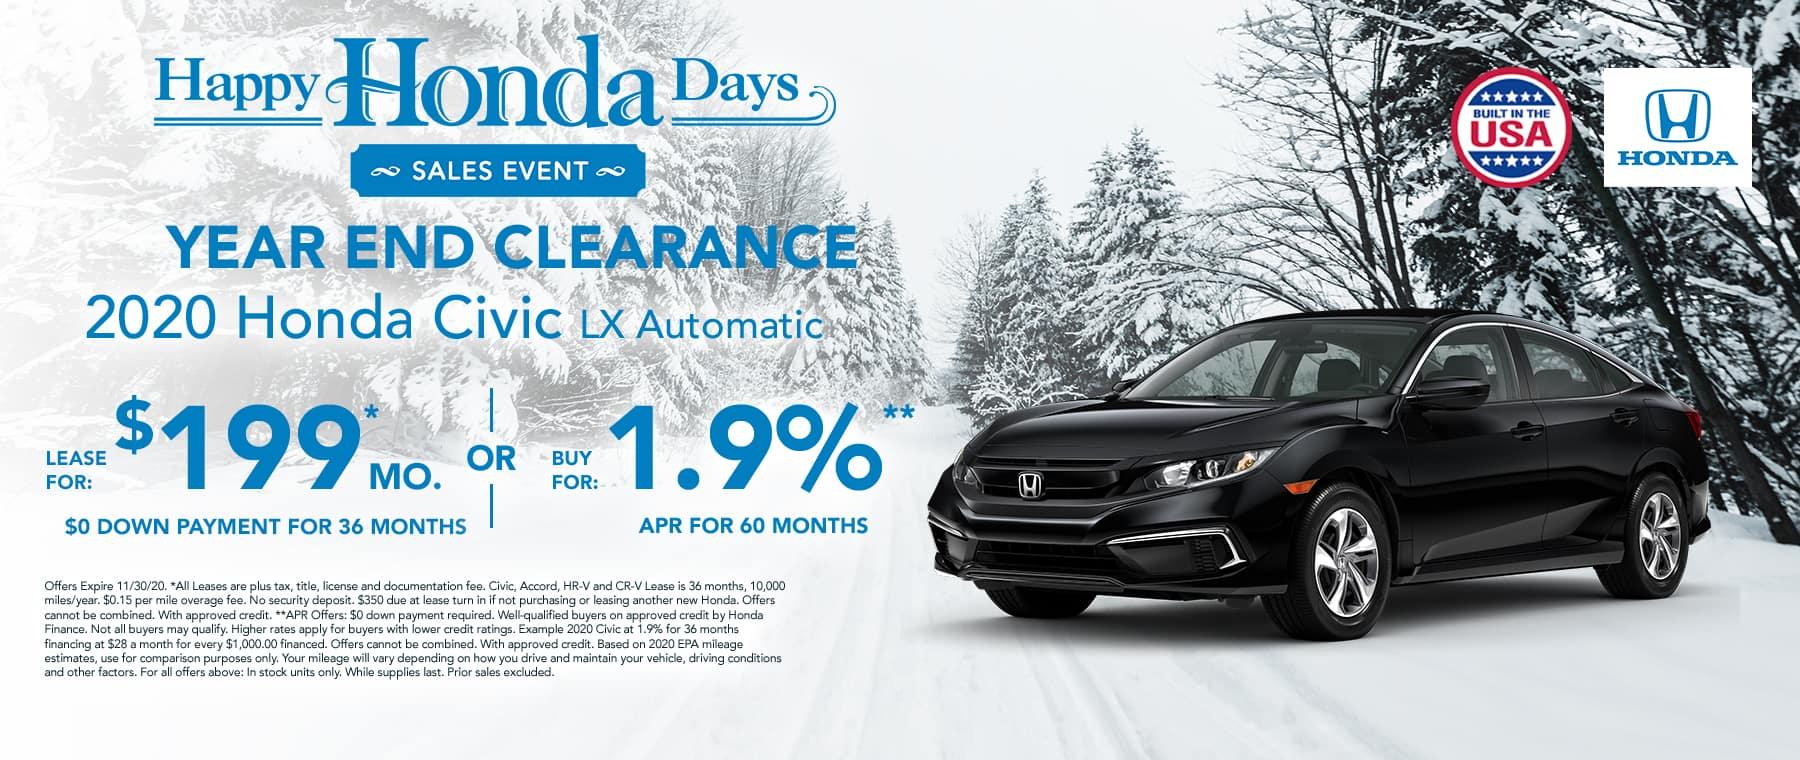 New 2020 Honda Civic $199 per month